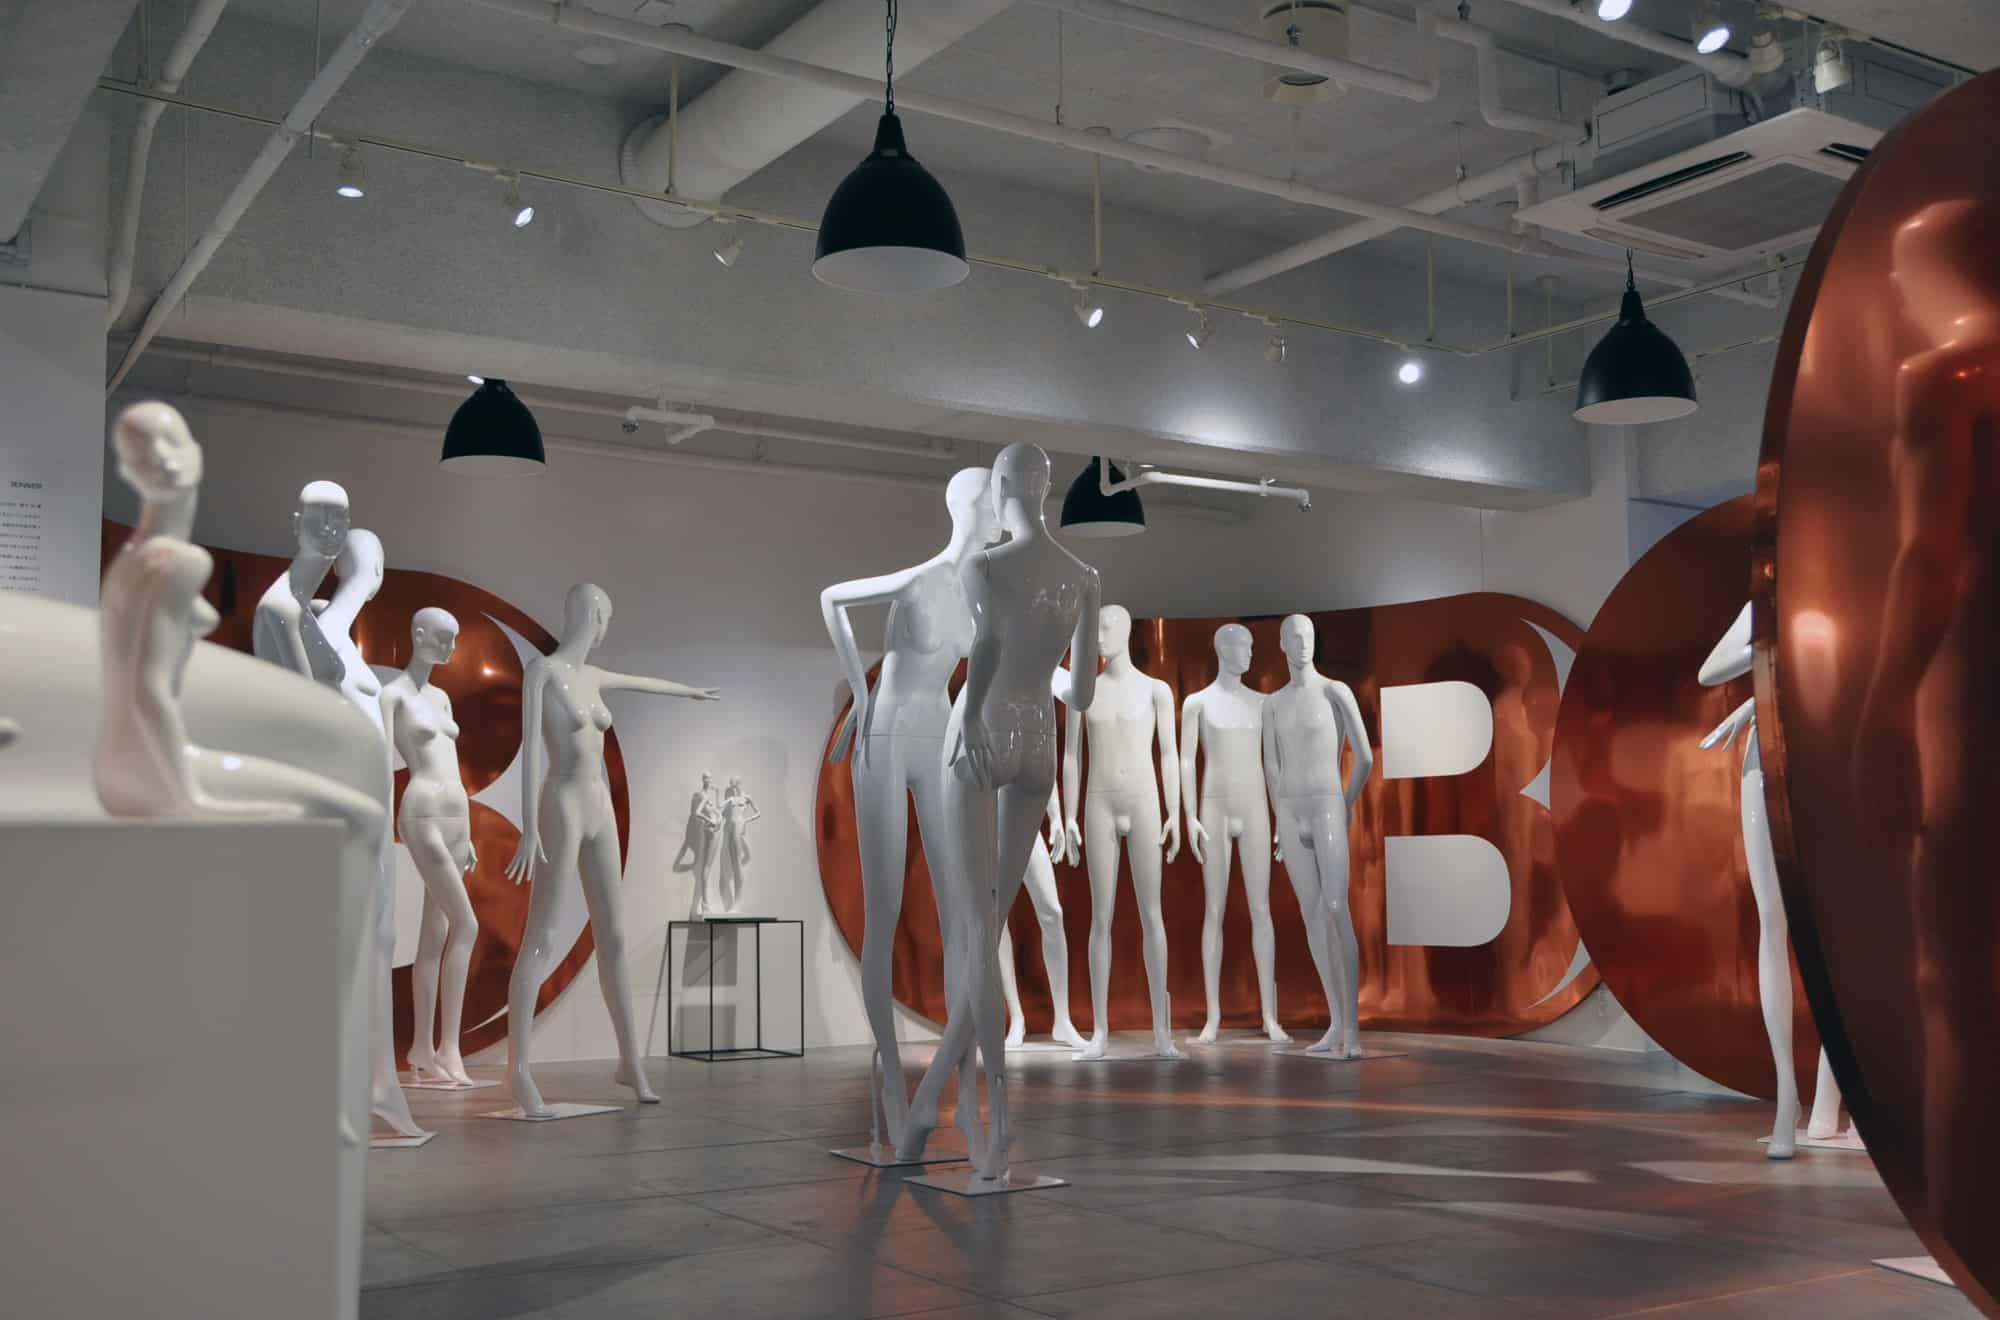 bonaveri mannequin exhibition tokyo japan 10